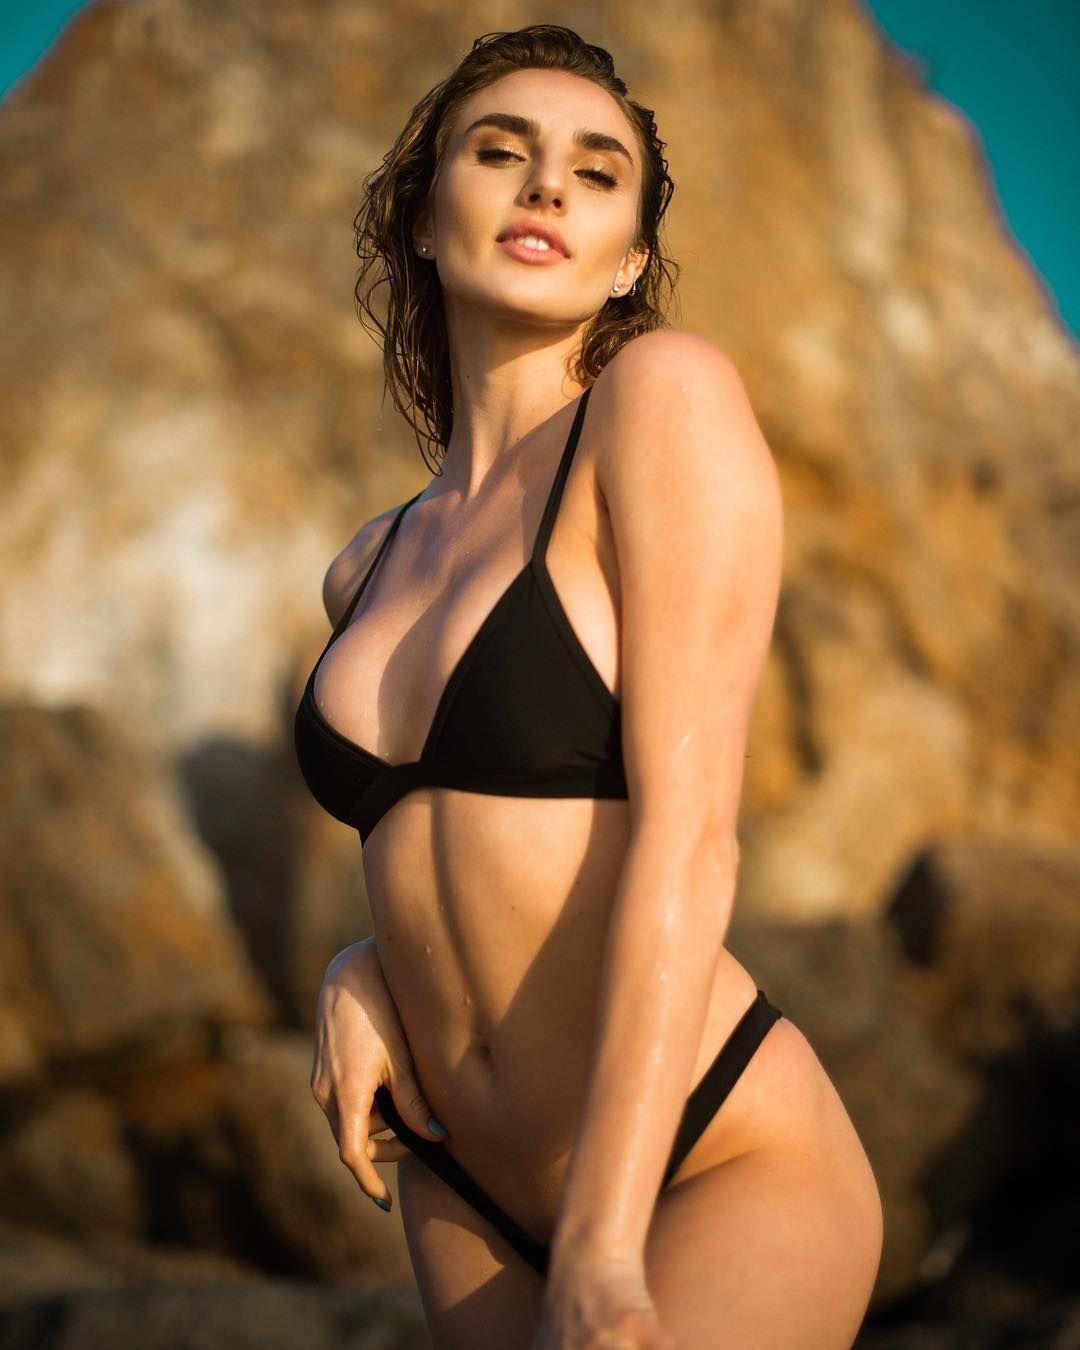 Bikini Mackenzie Thoma naked (22 photo), Ass, Is a cute, Instagram, underwear 2019